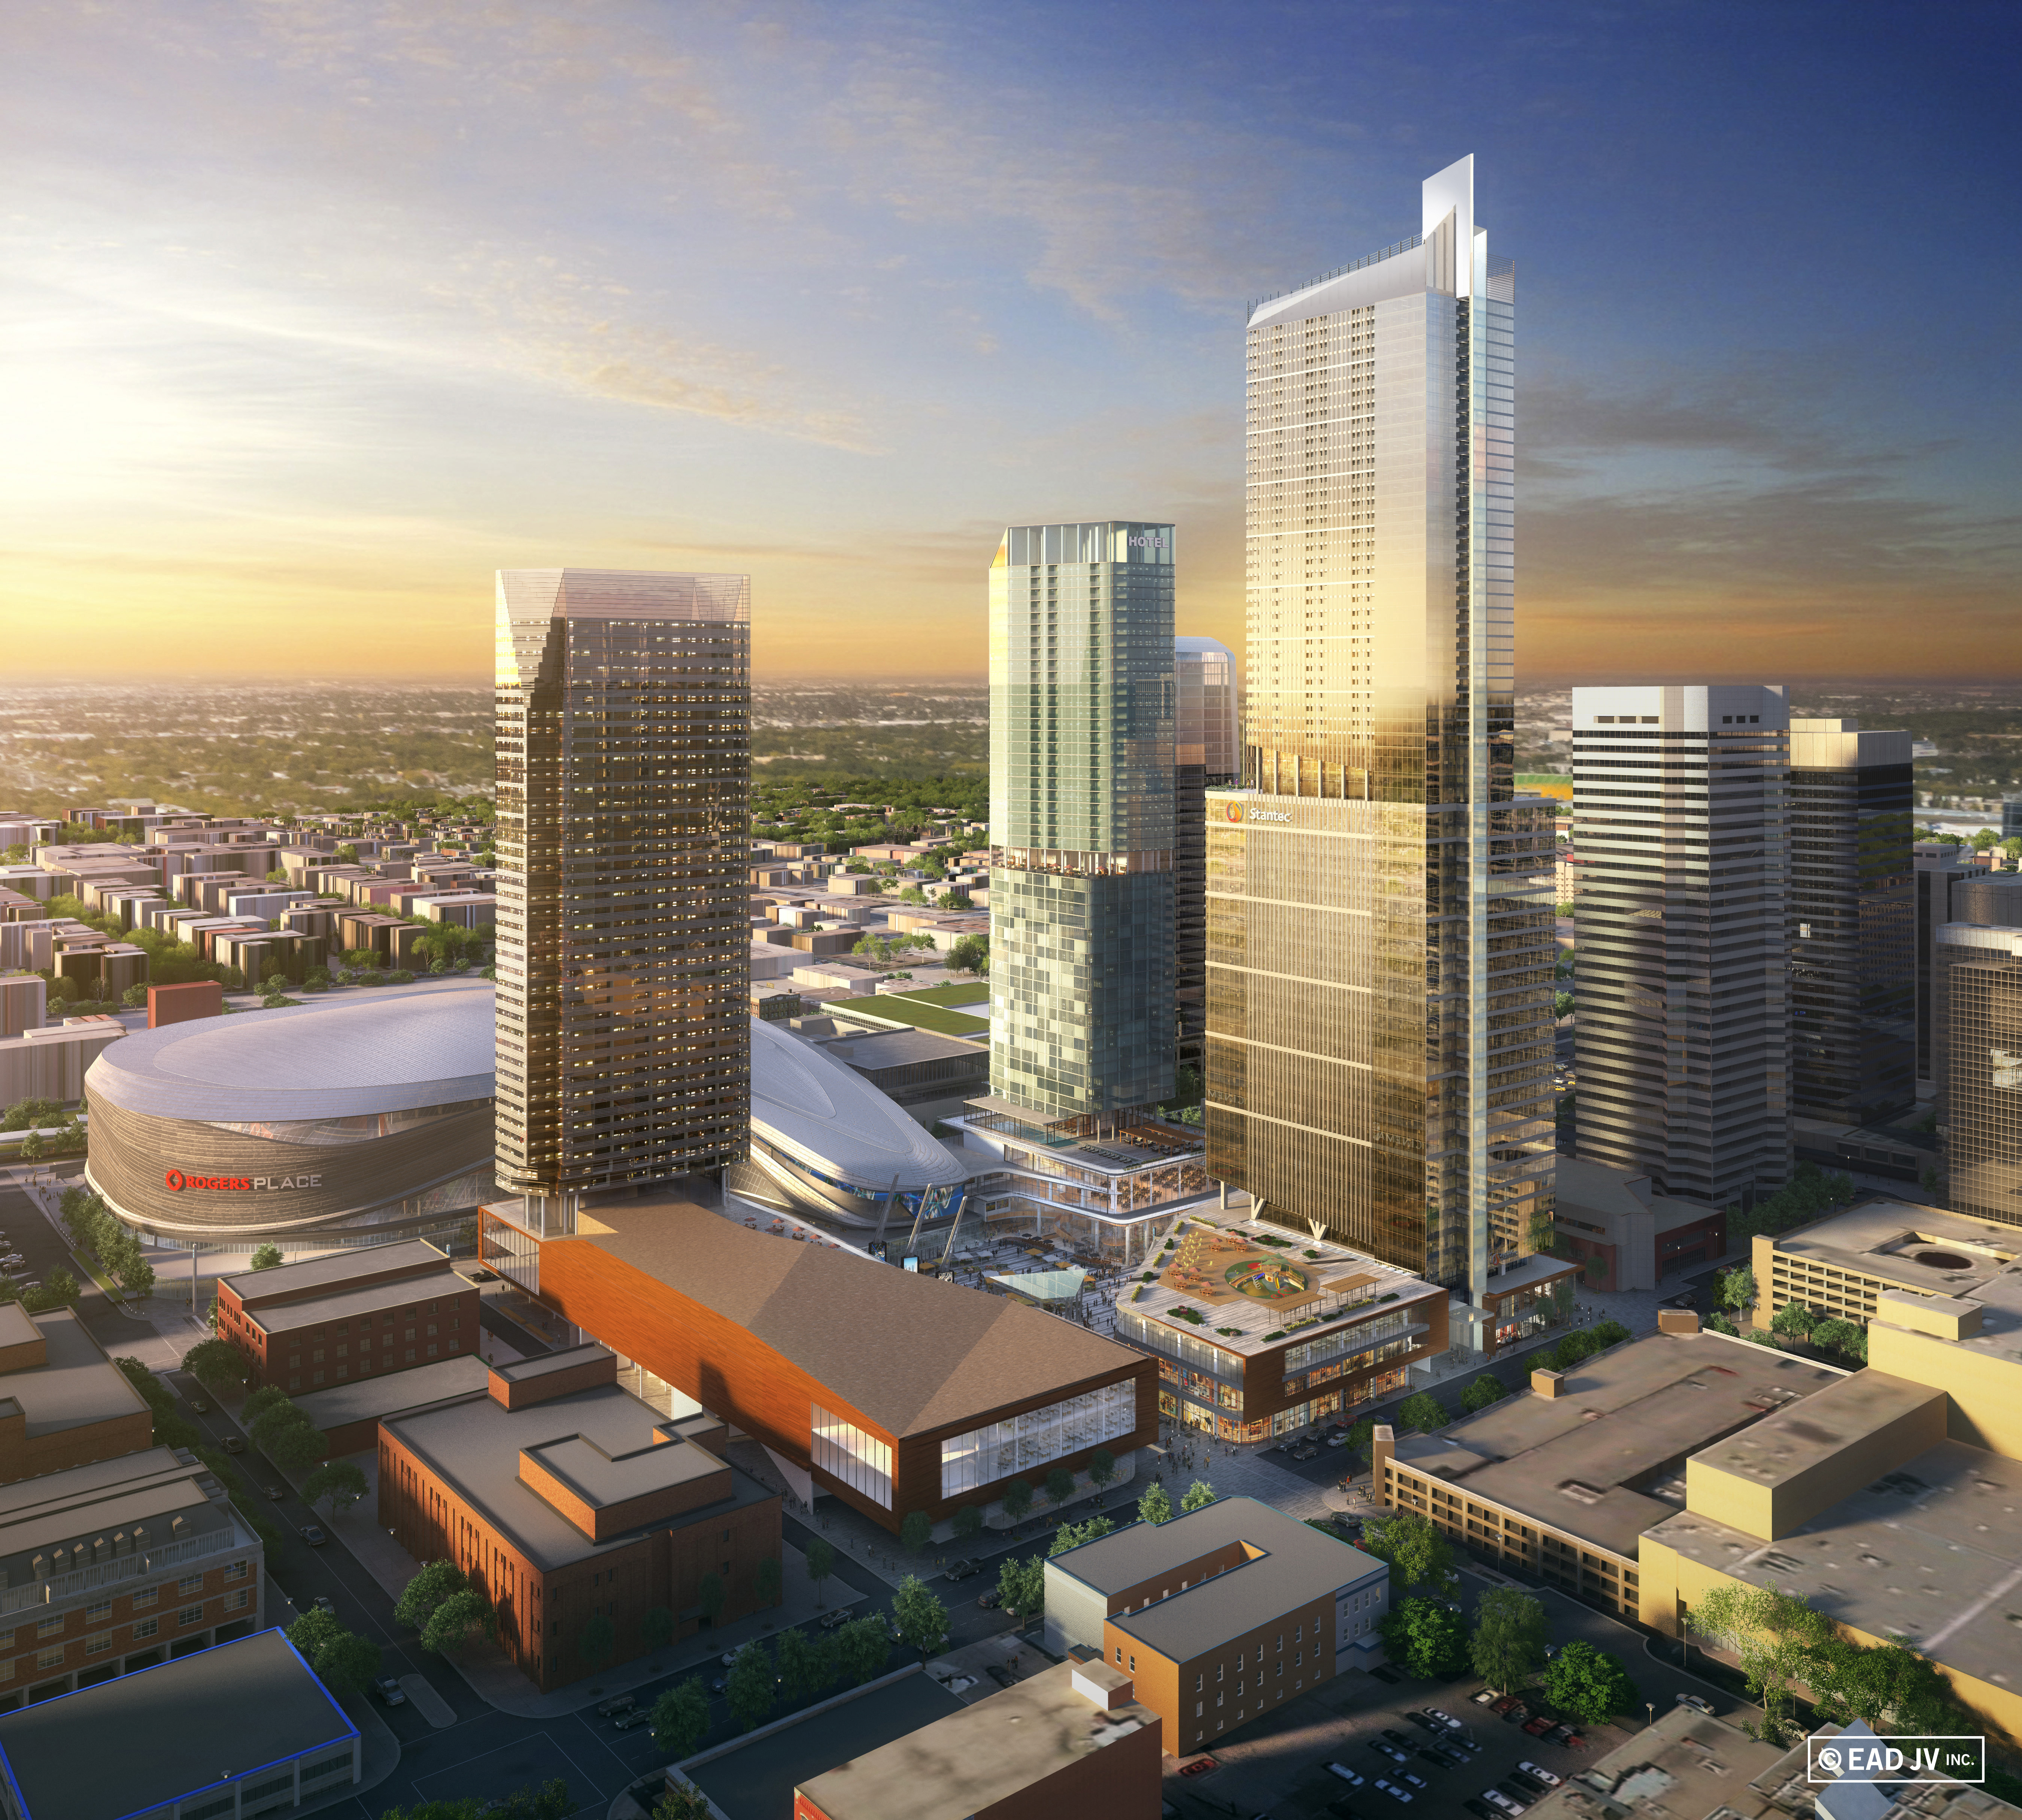 News Construction Of Edmonton S Tallest Tower To Begin